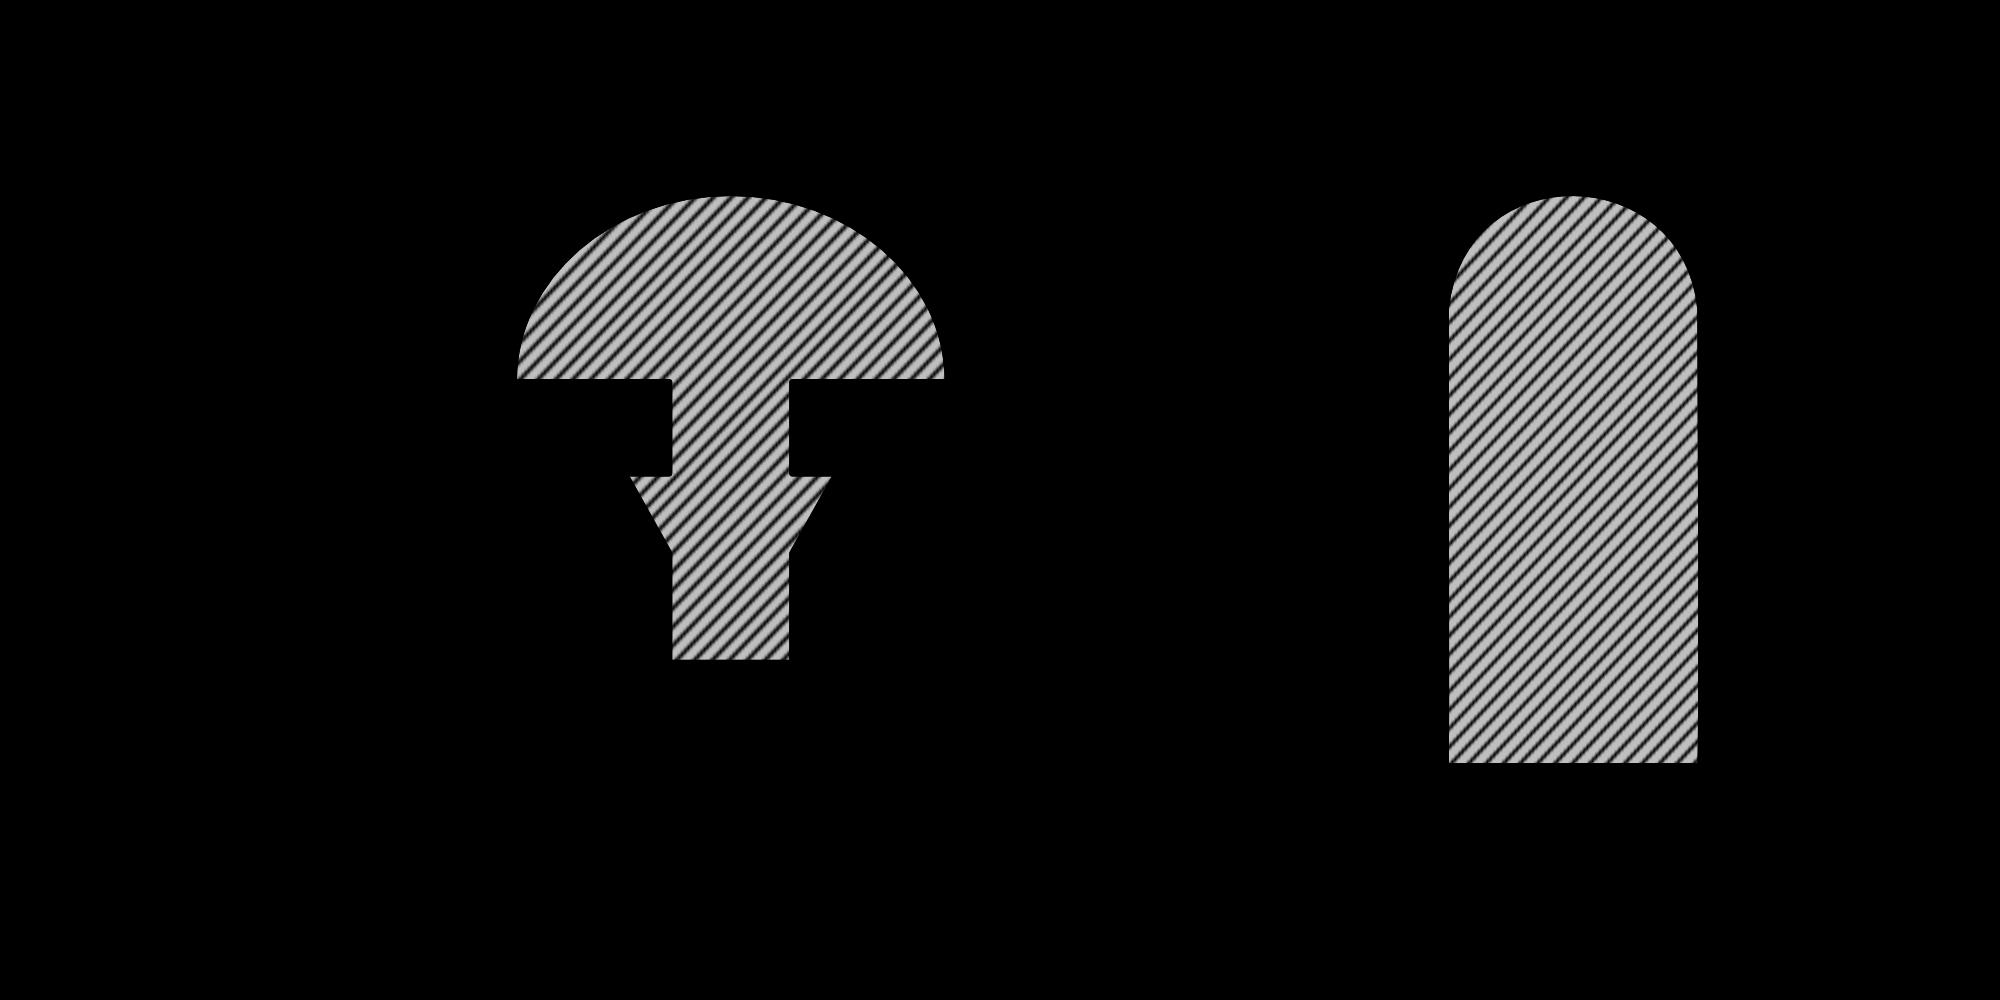 Bar frets vs. modern fret wire